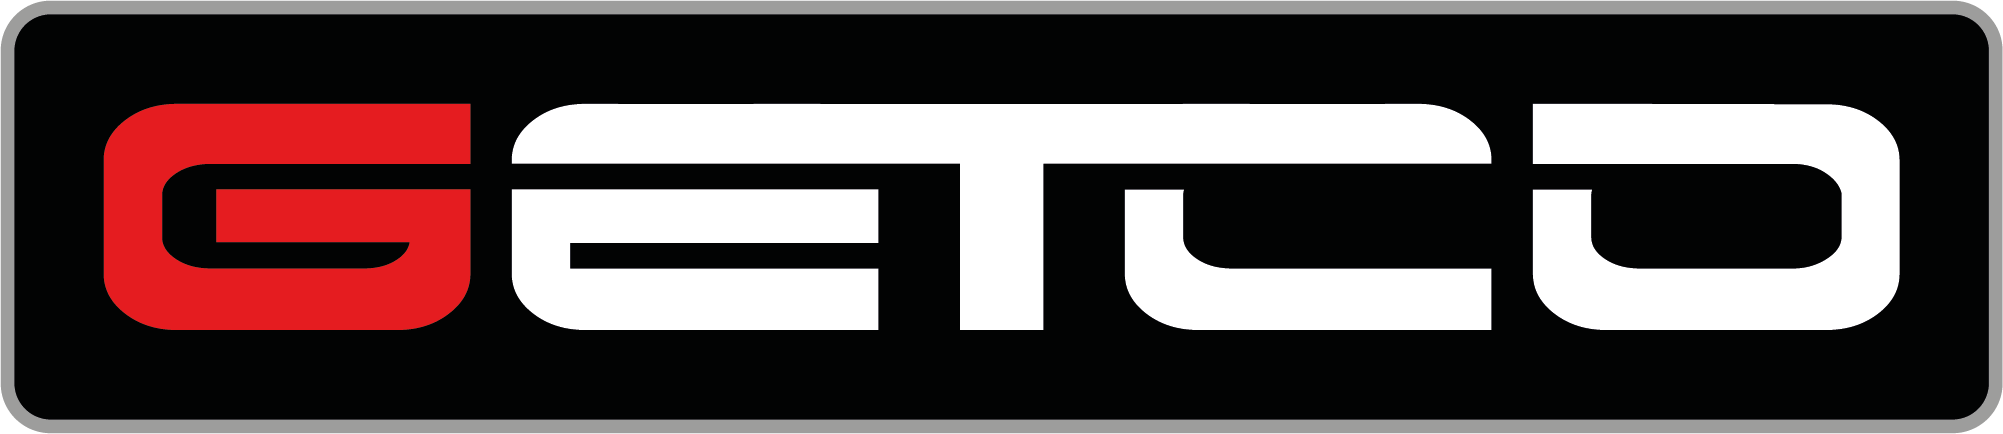 GETCO Sports GmbH